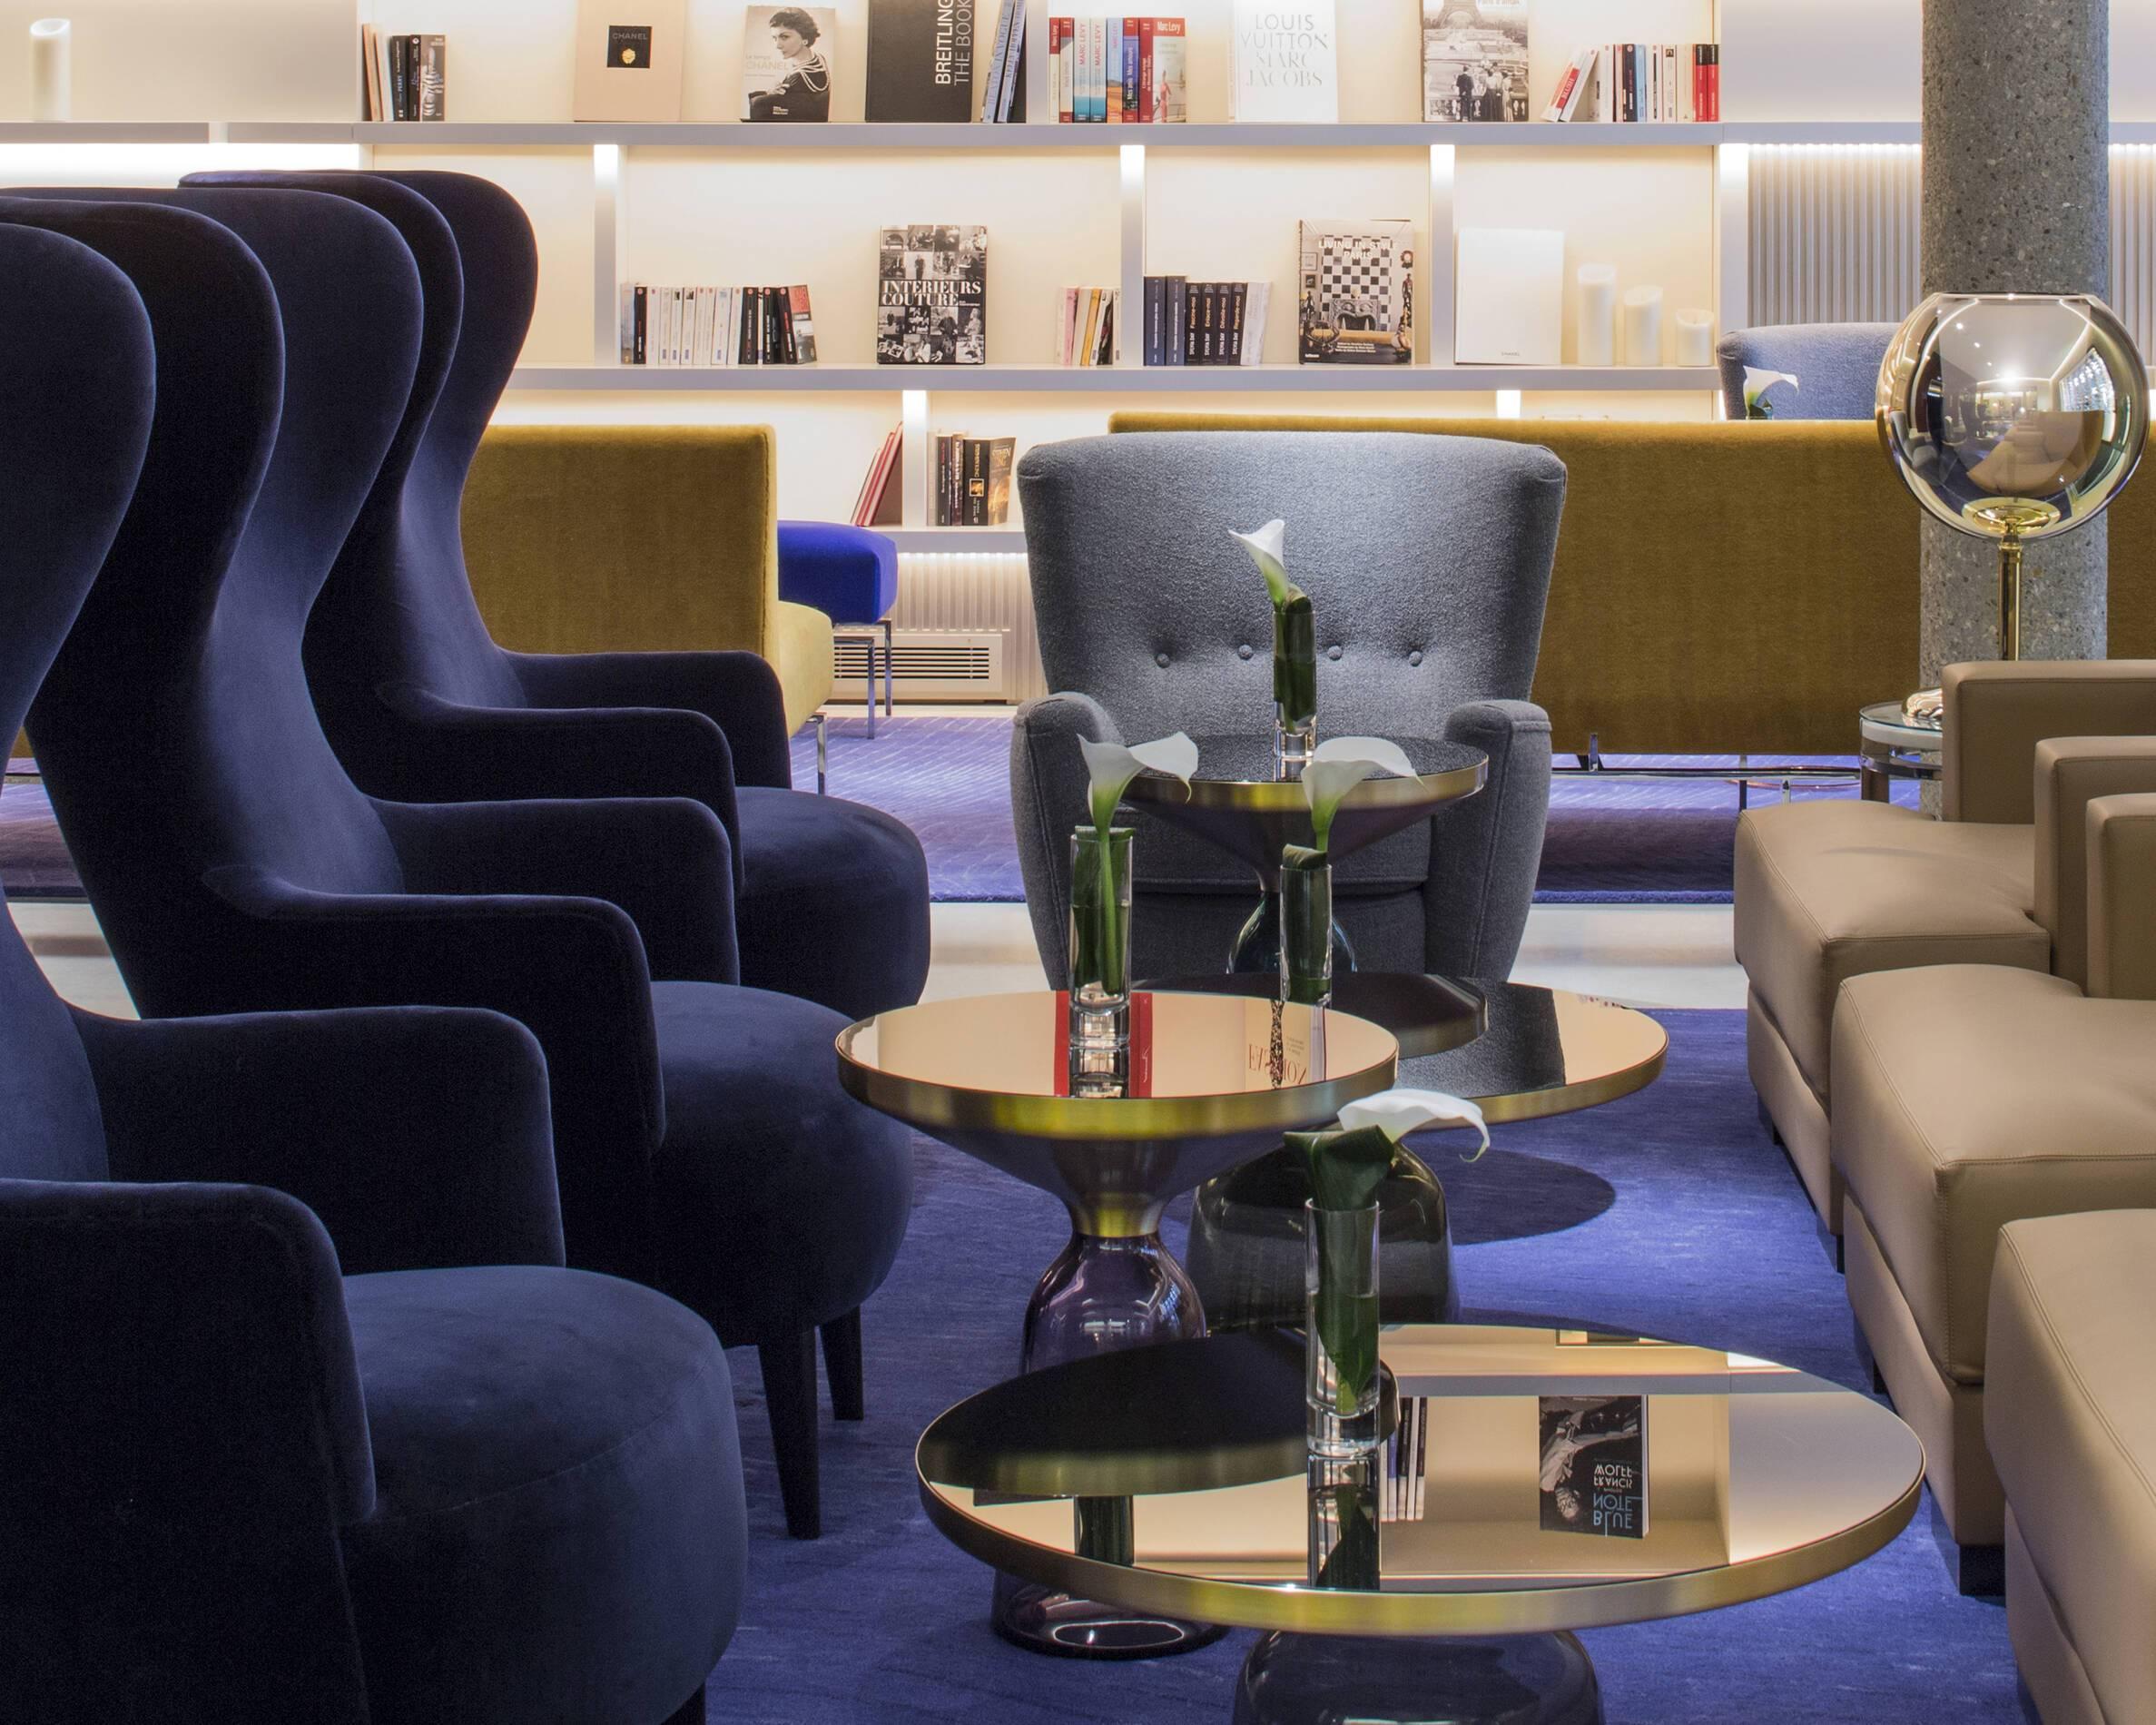 Hotel Sers salon Paris